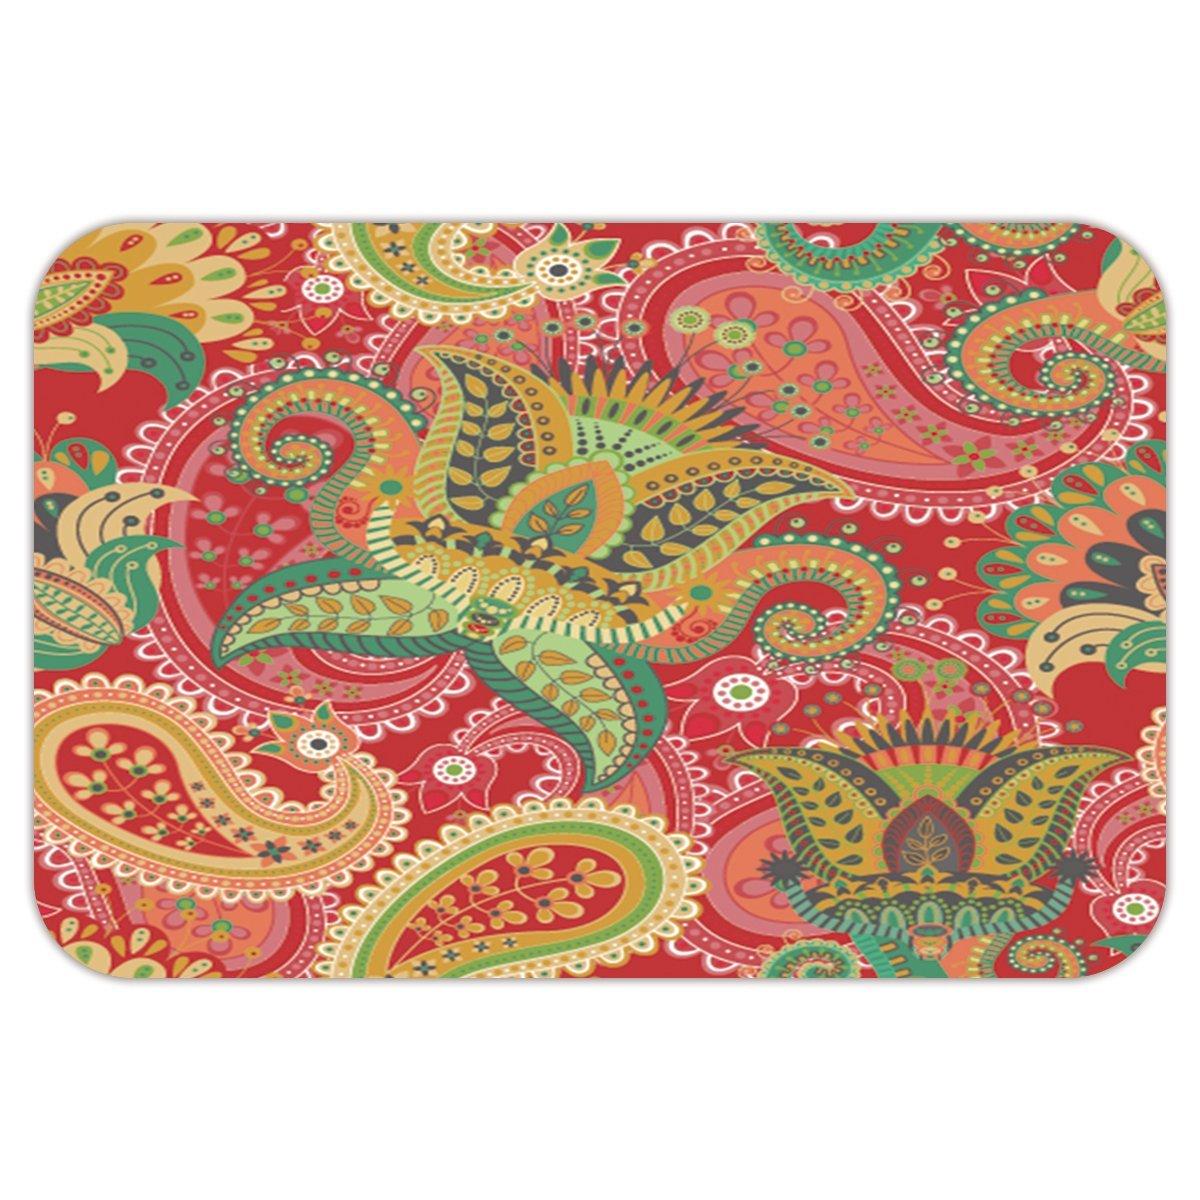 SCOCICI Brand Custom Coral Fleece/Coral Velvet & Non-slip Rubber Backing Indoor / Outdoor / Bathroom/Kitchen/Workstations Doormat Mat Rug,Stylish,Decorative,Unique,Cool,Fun,Funky